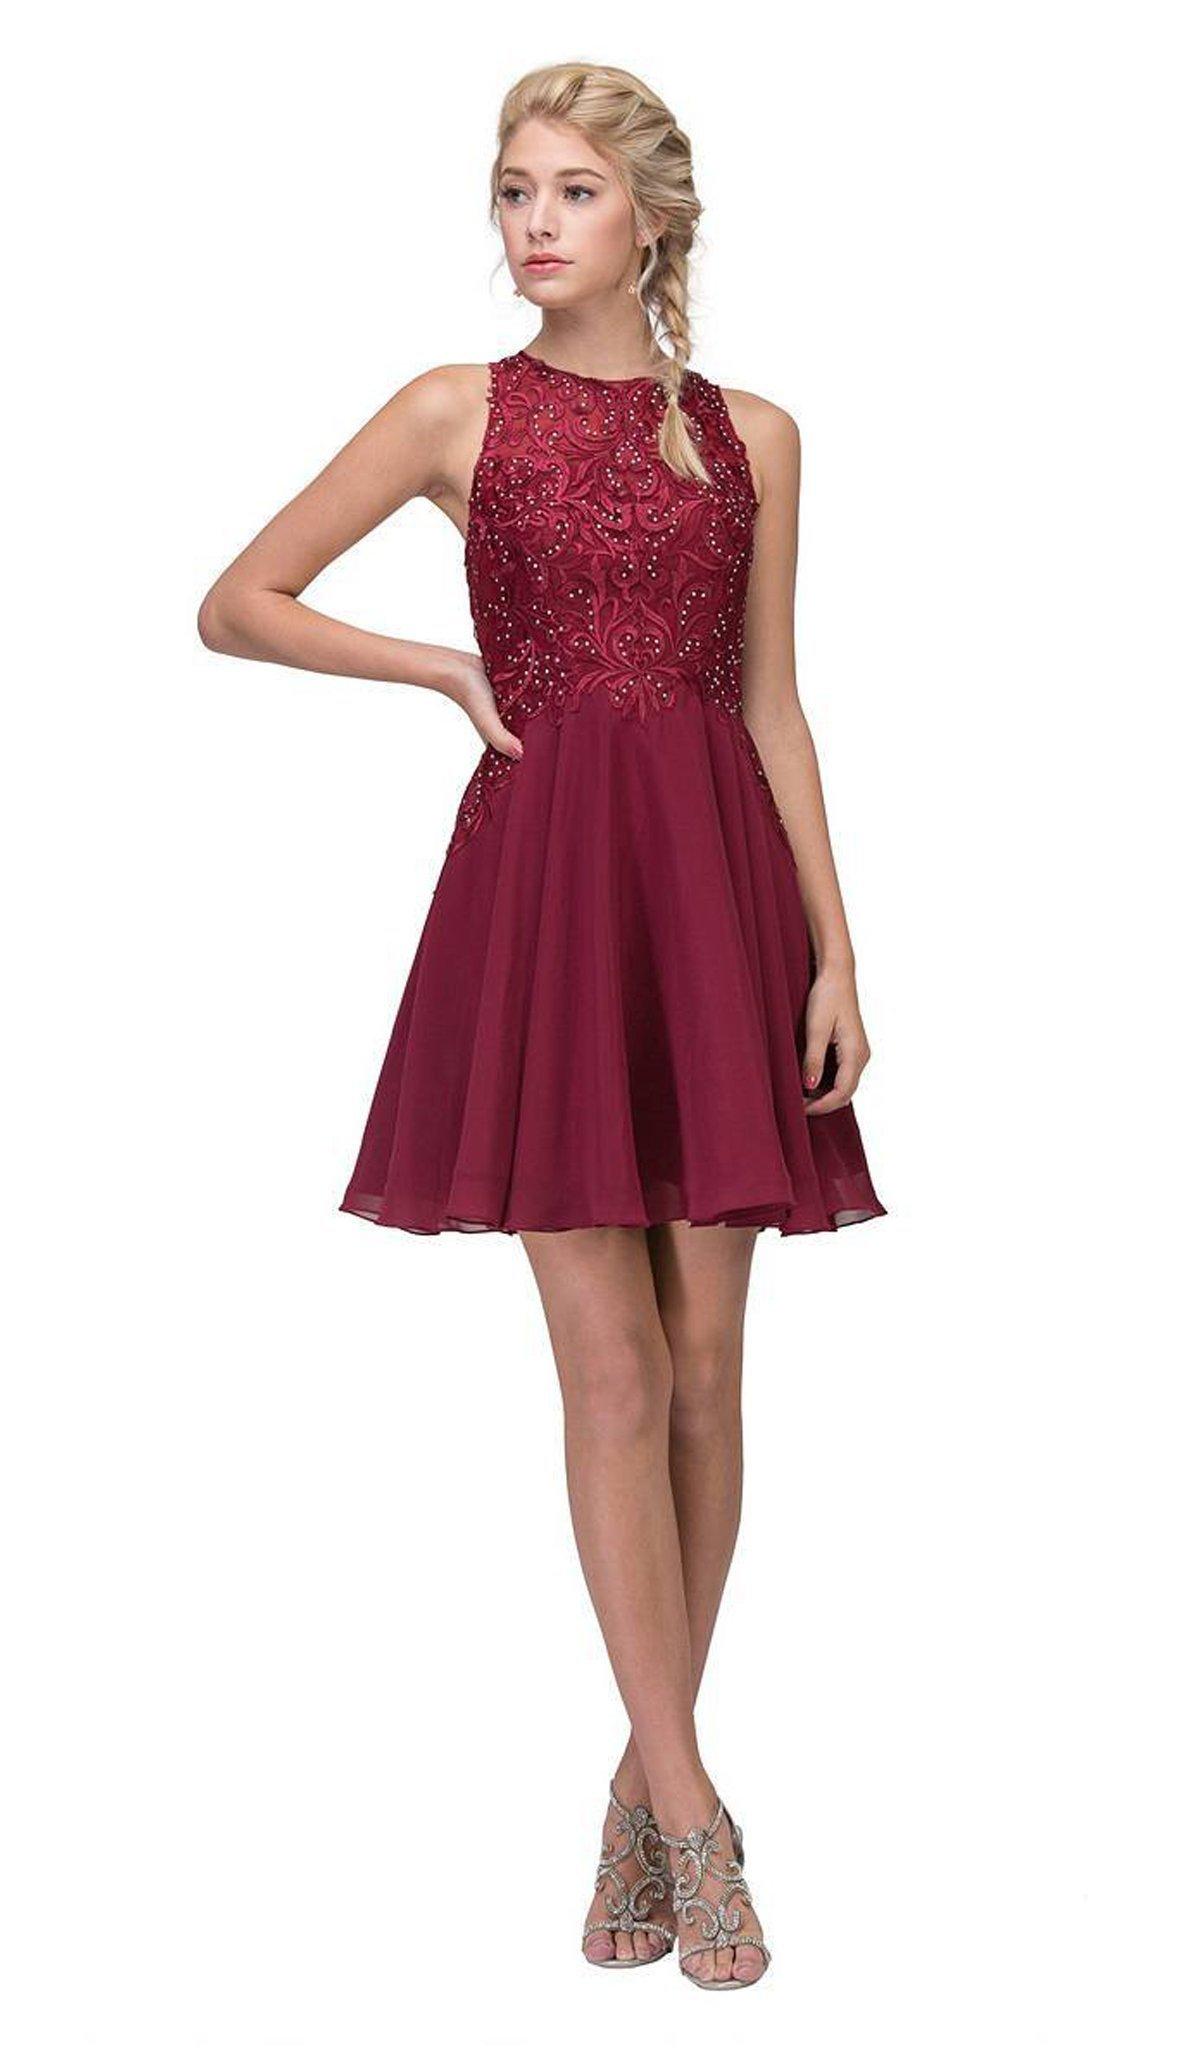 Eureka Fashion - 6025 Lace Halter Chiffon A-line Dress